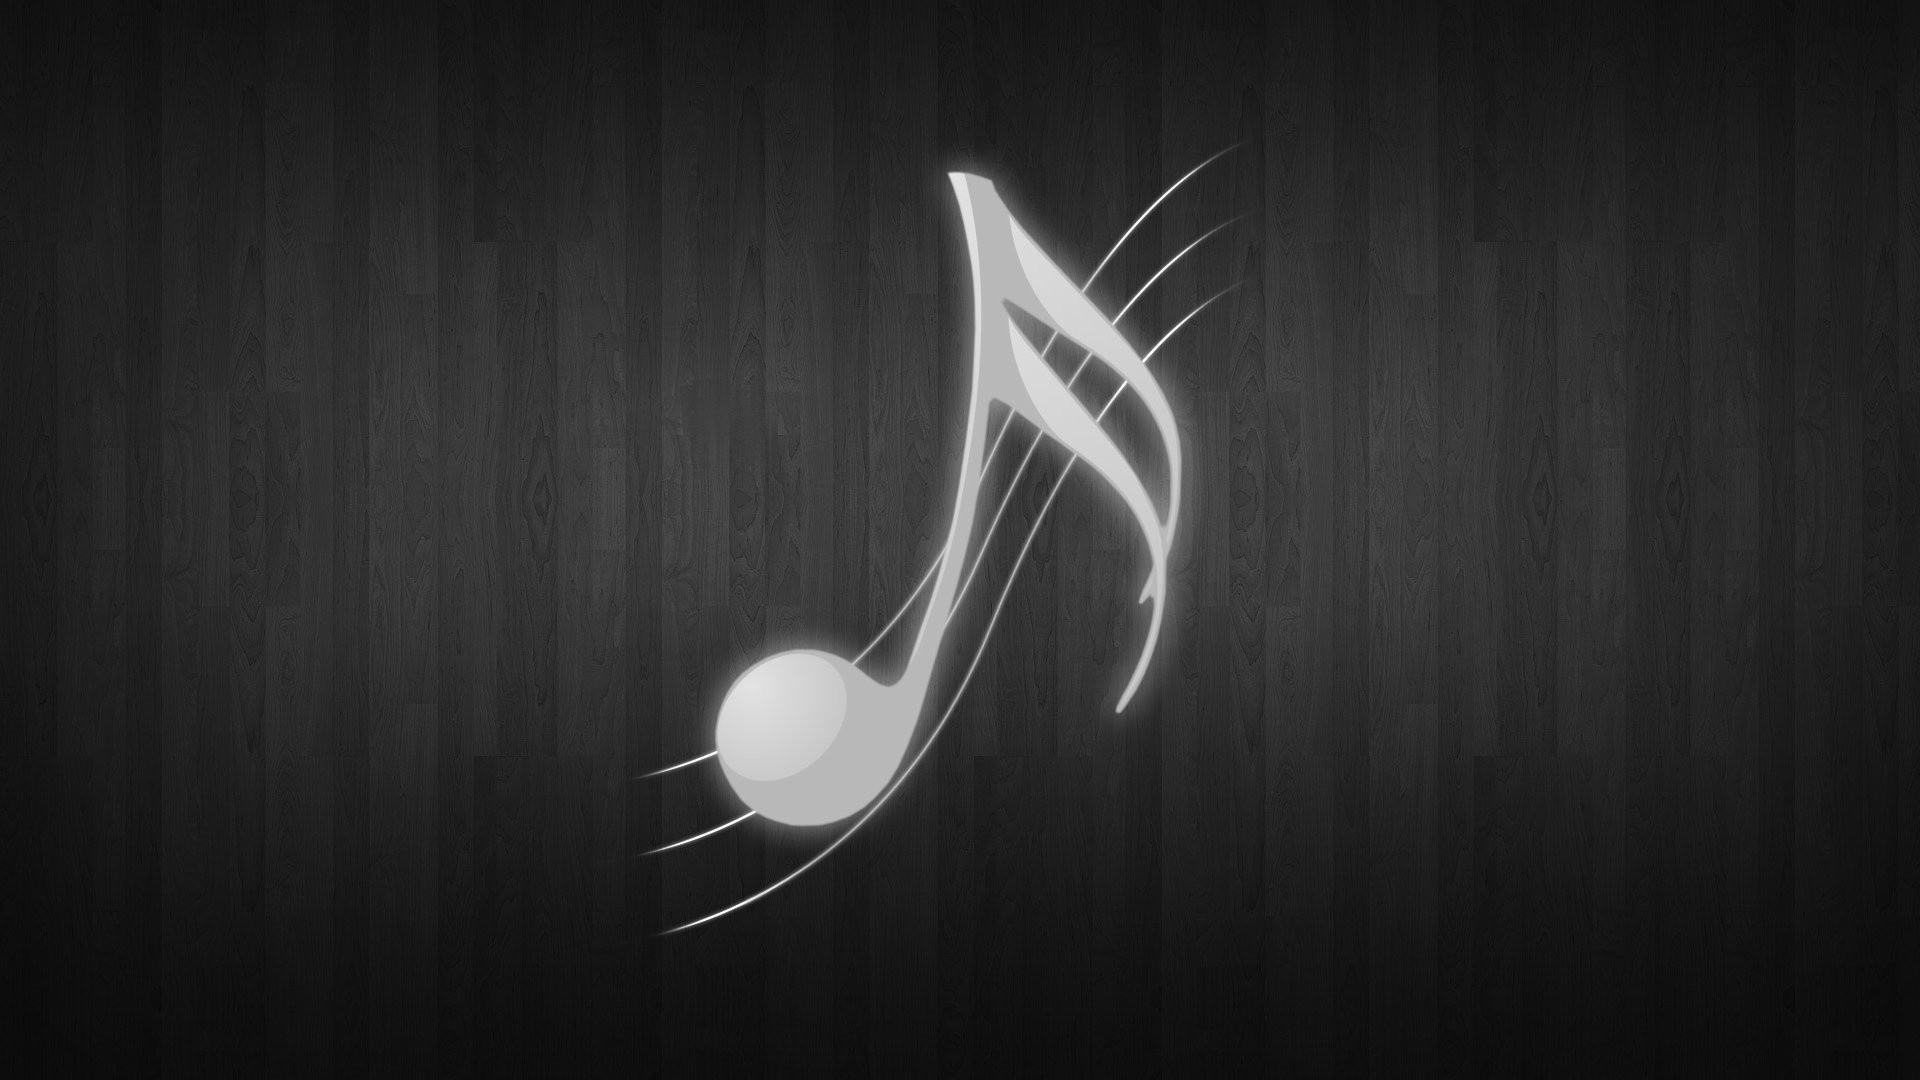 673025-best-note-music-wallpapers-1920x1080.jpg